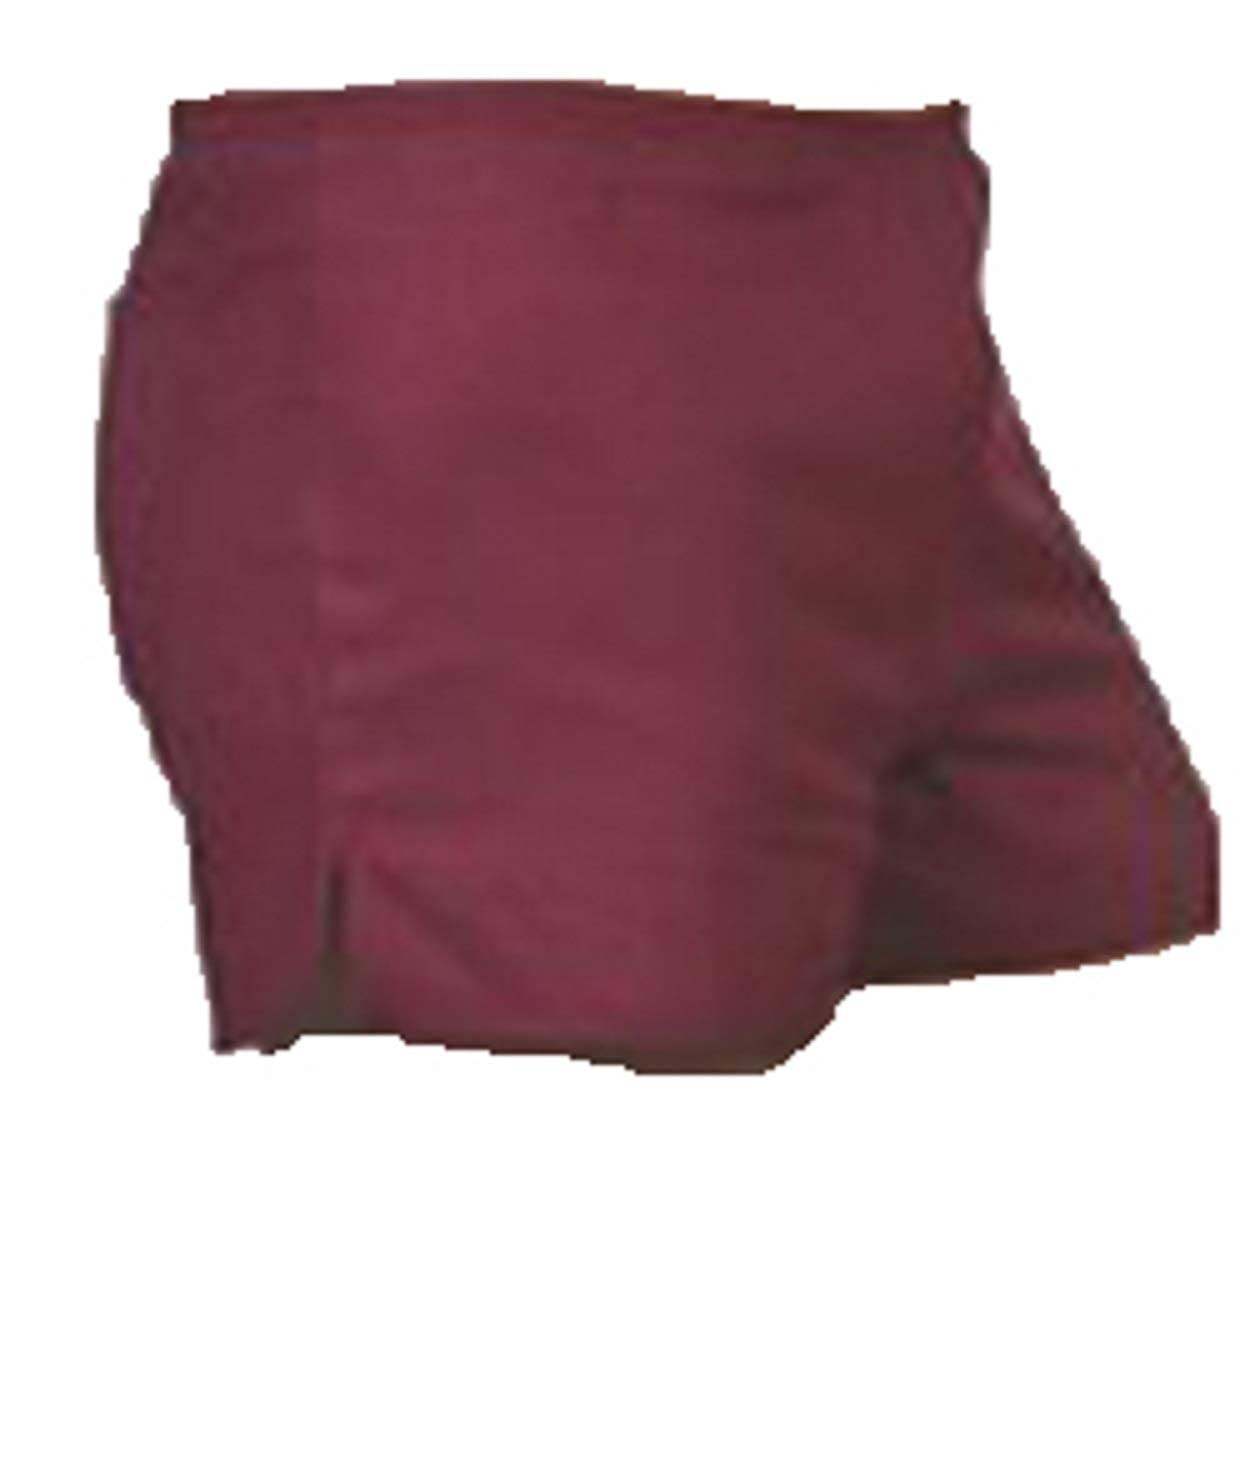 blau weinrot, 9 rot DDR Turnhose Nostalgie Shorts kurze Hose gr/ün